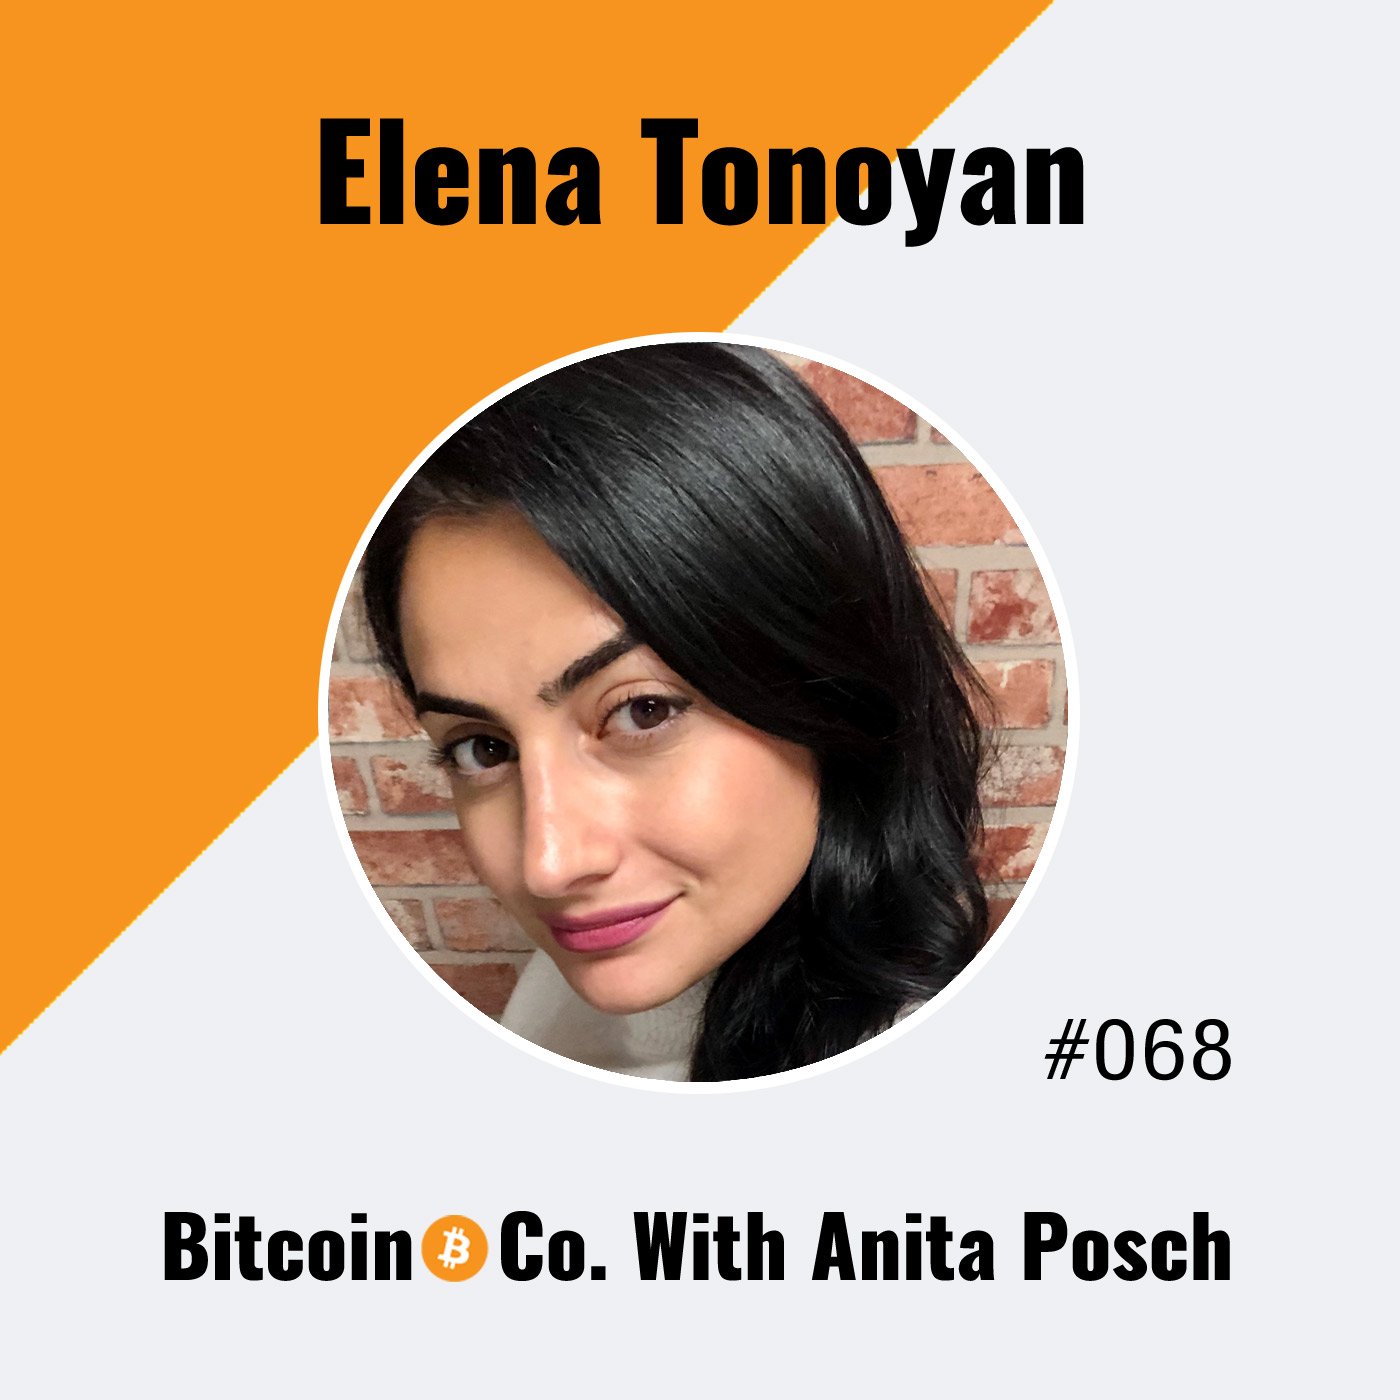 Elena Tonoyan, LocalBitcoins COO: Bitcoin Provides Financial Inclusion and Will Grow